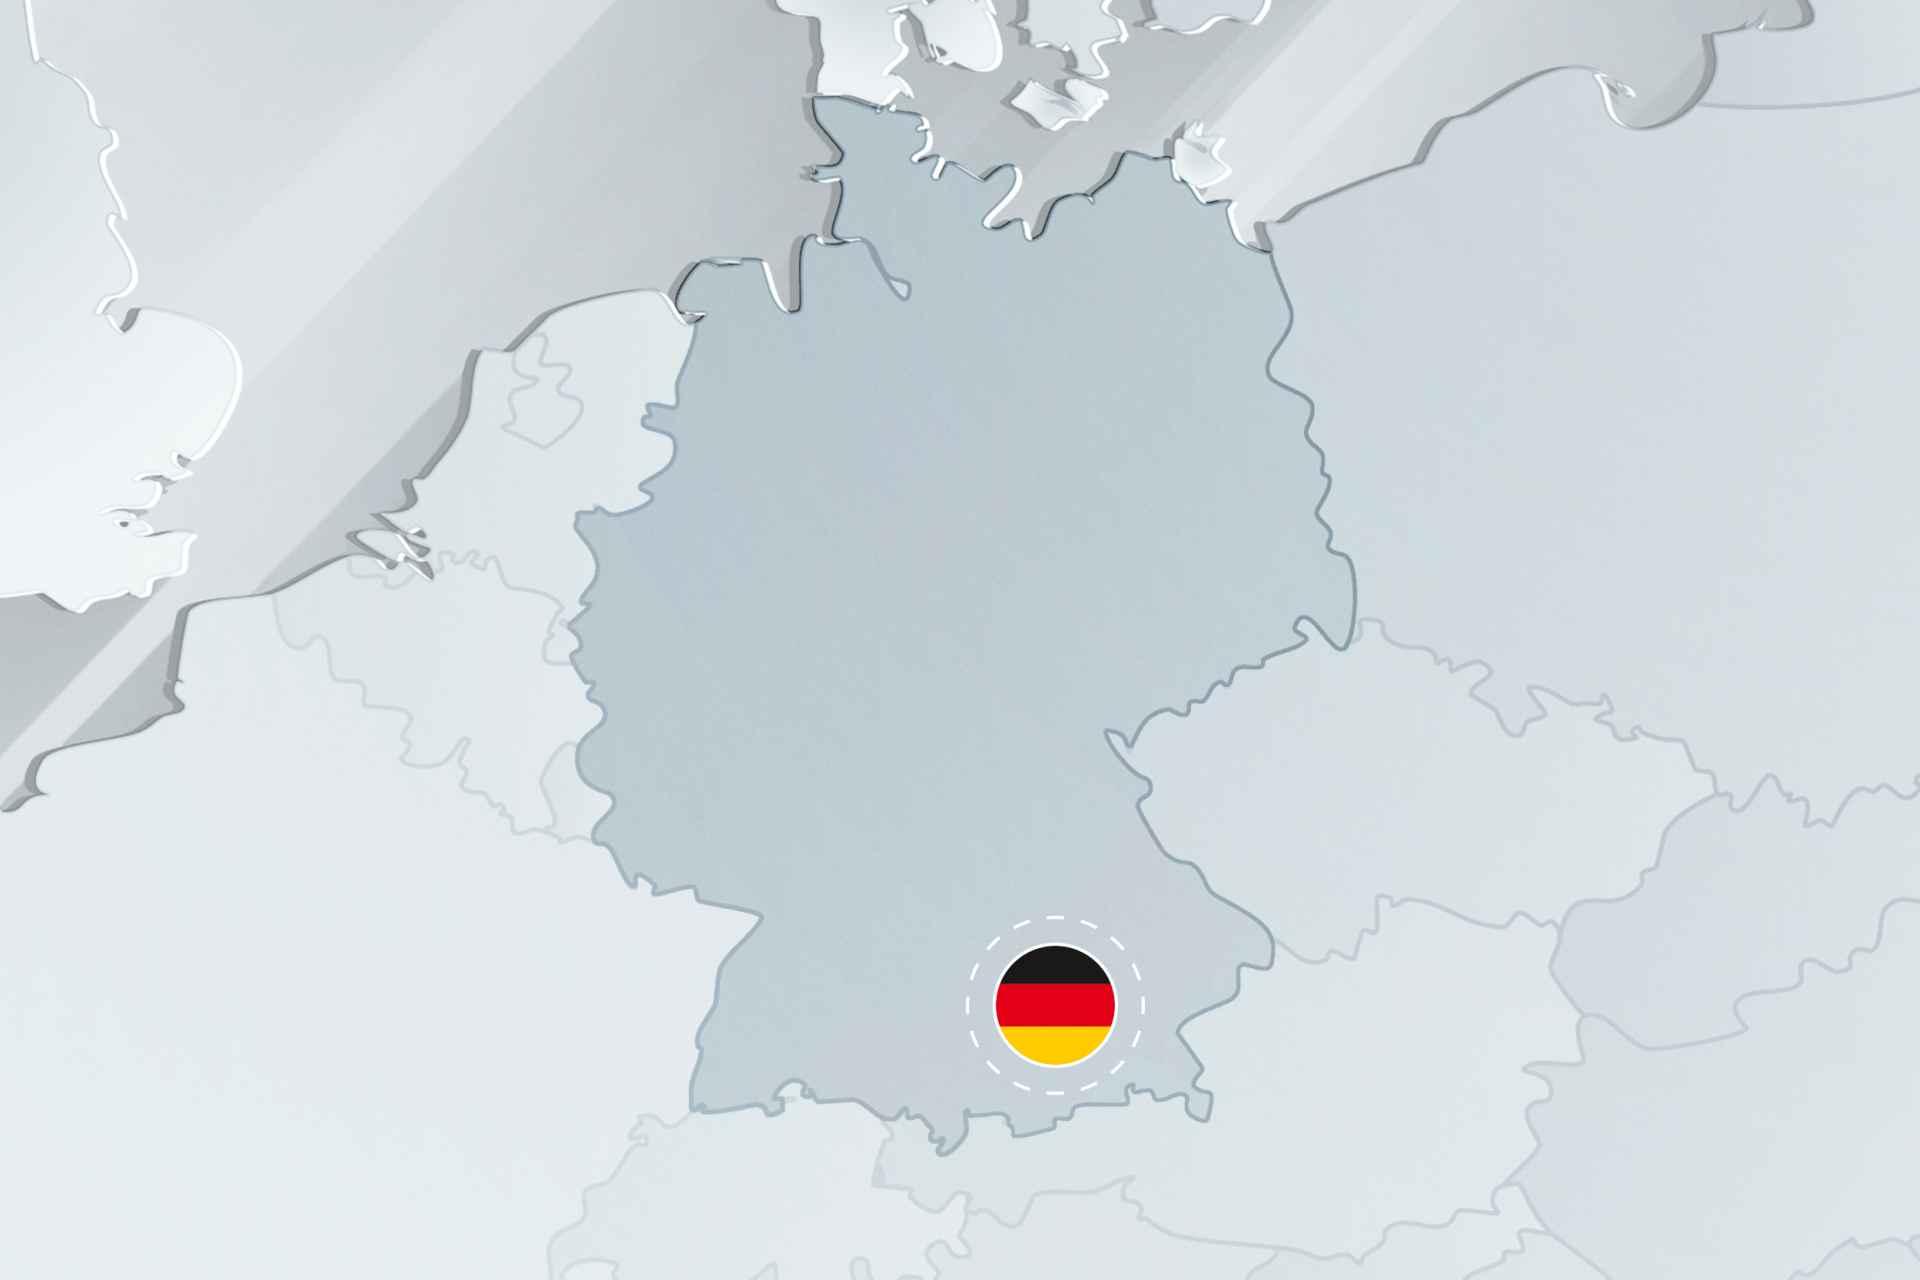 europe-political-map_standort-de